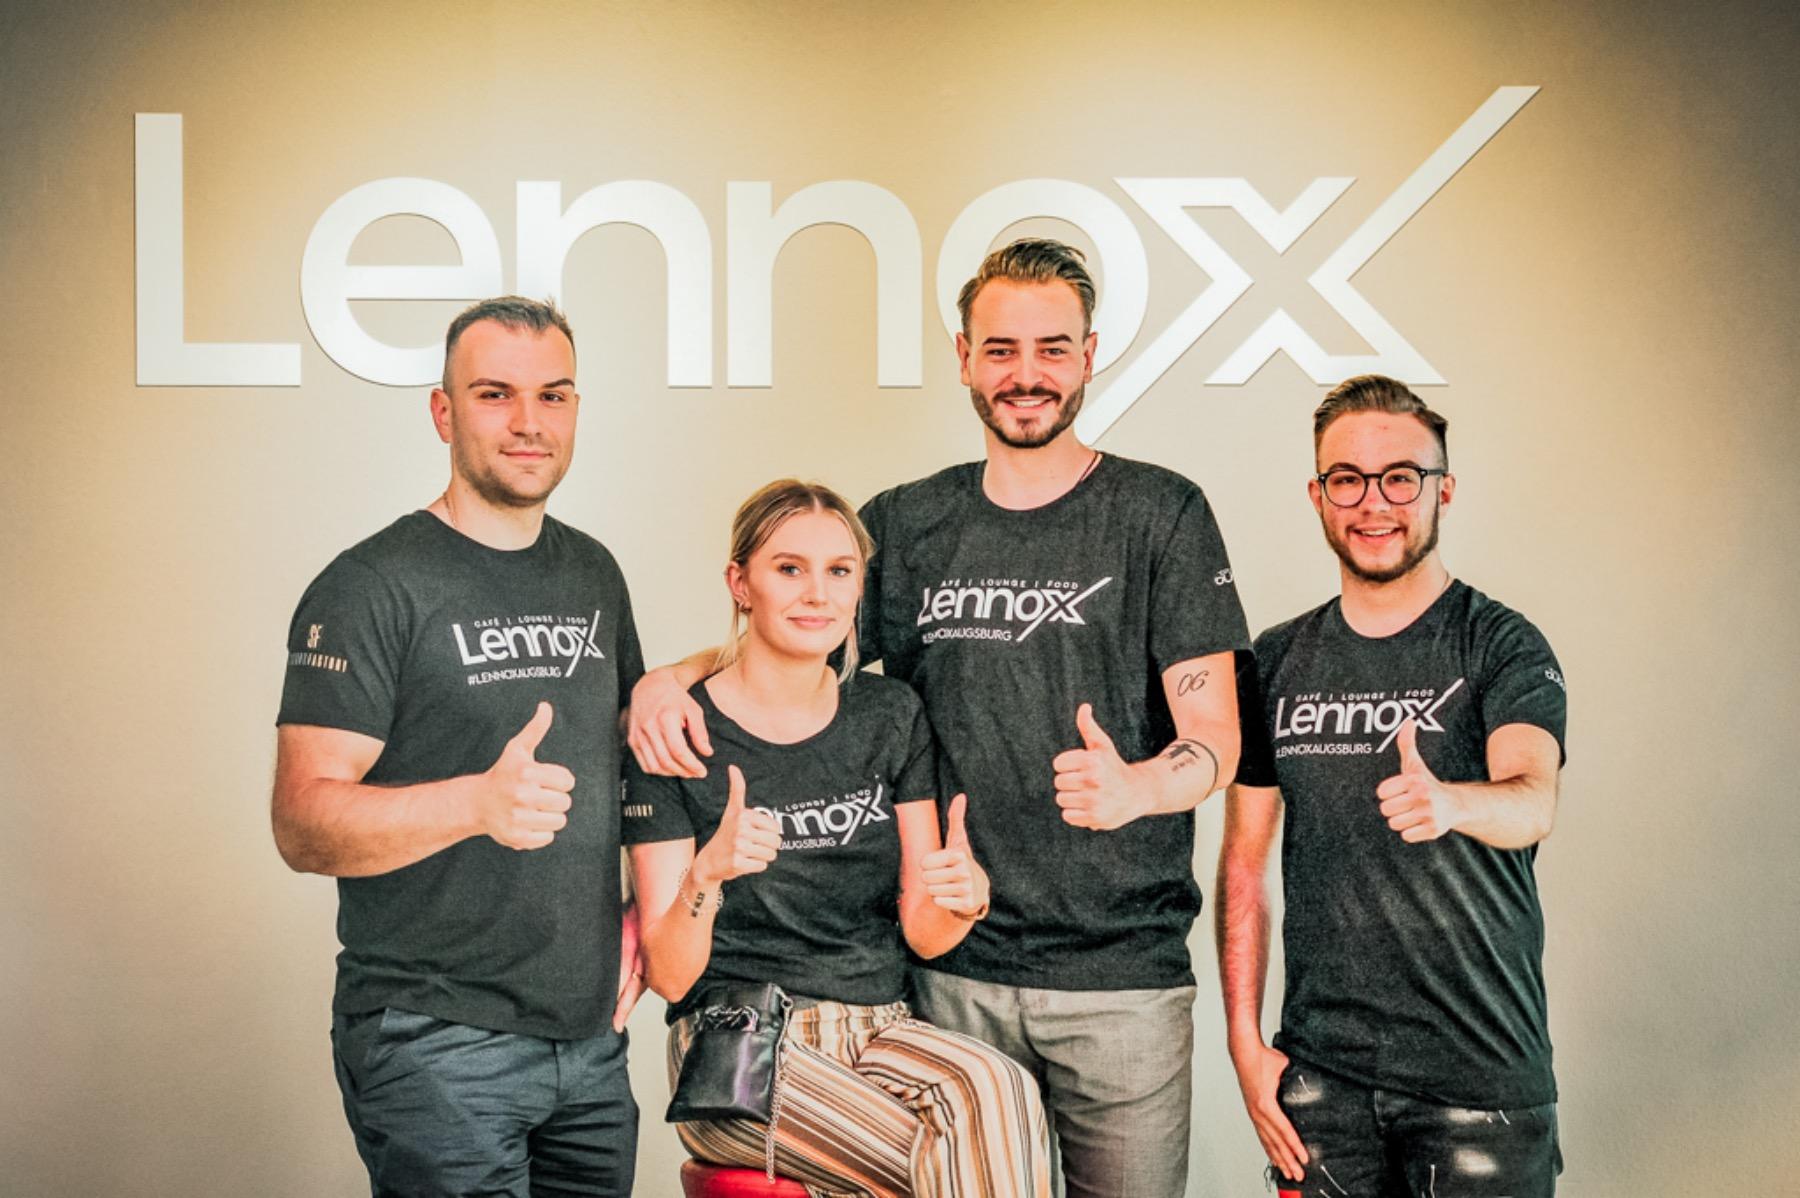 geheimtipp augsburg Lennox – ©Lennox Café-Bar-Lounge